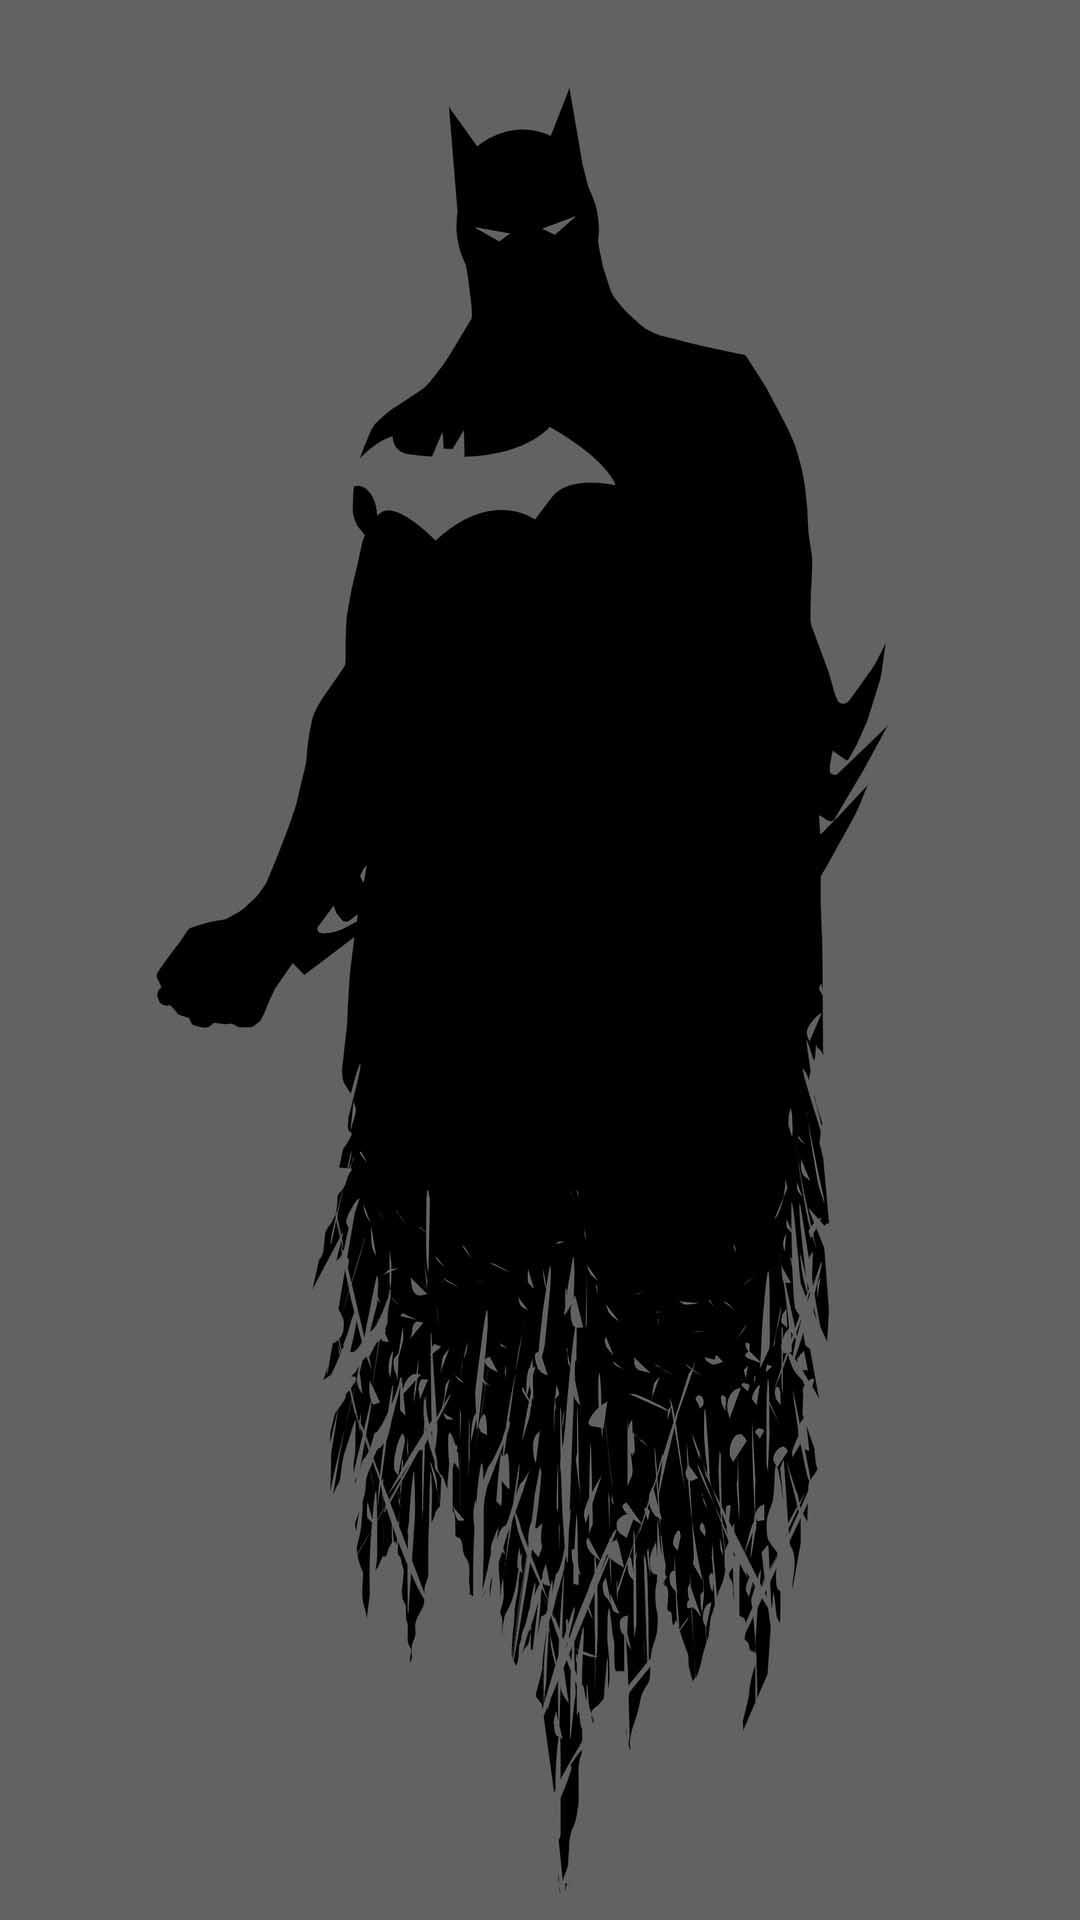 batman hd wallpapers for mobile